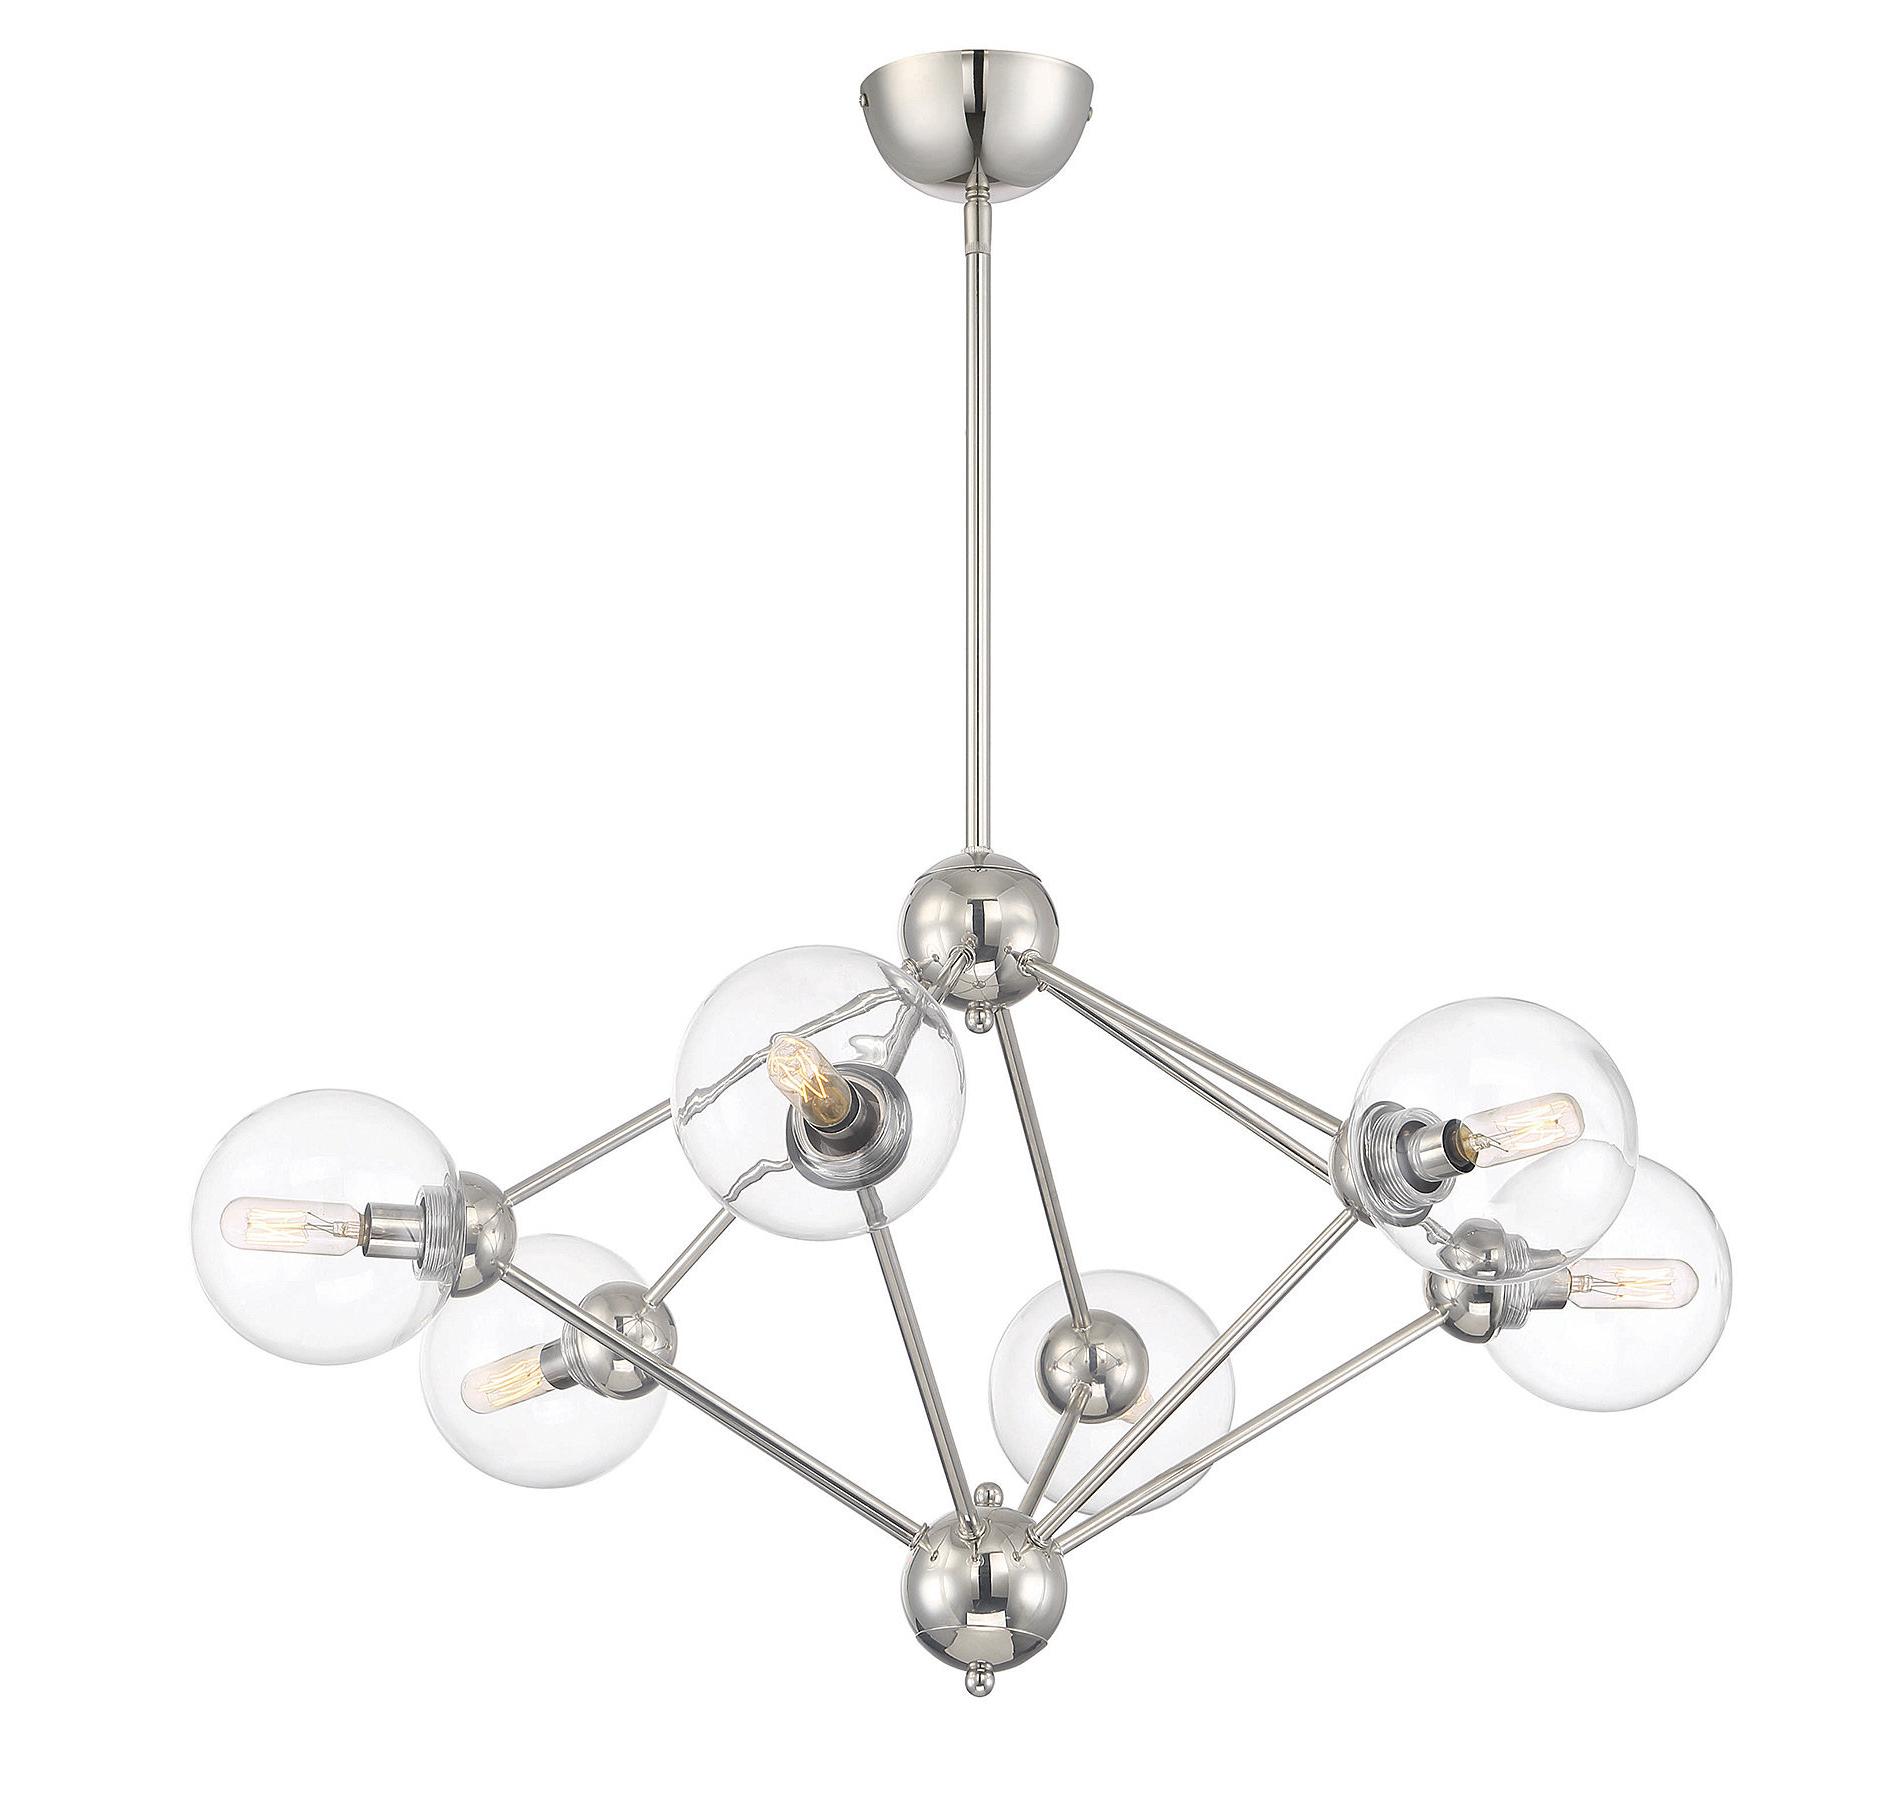 Valetta 6 Light Geometric Chandelier With 2019 Asher 12 Light Sputnik Chandeliers (Gallery 11 of 25)